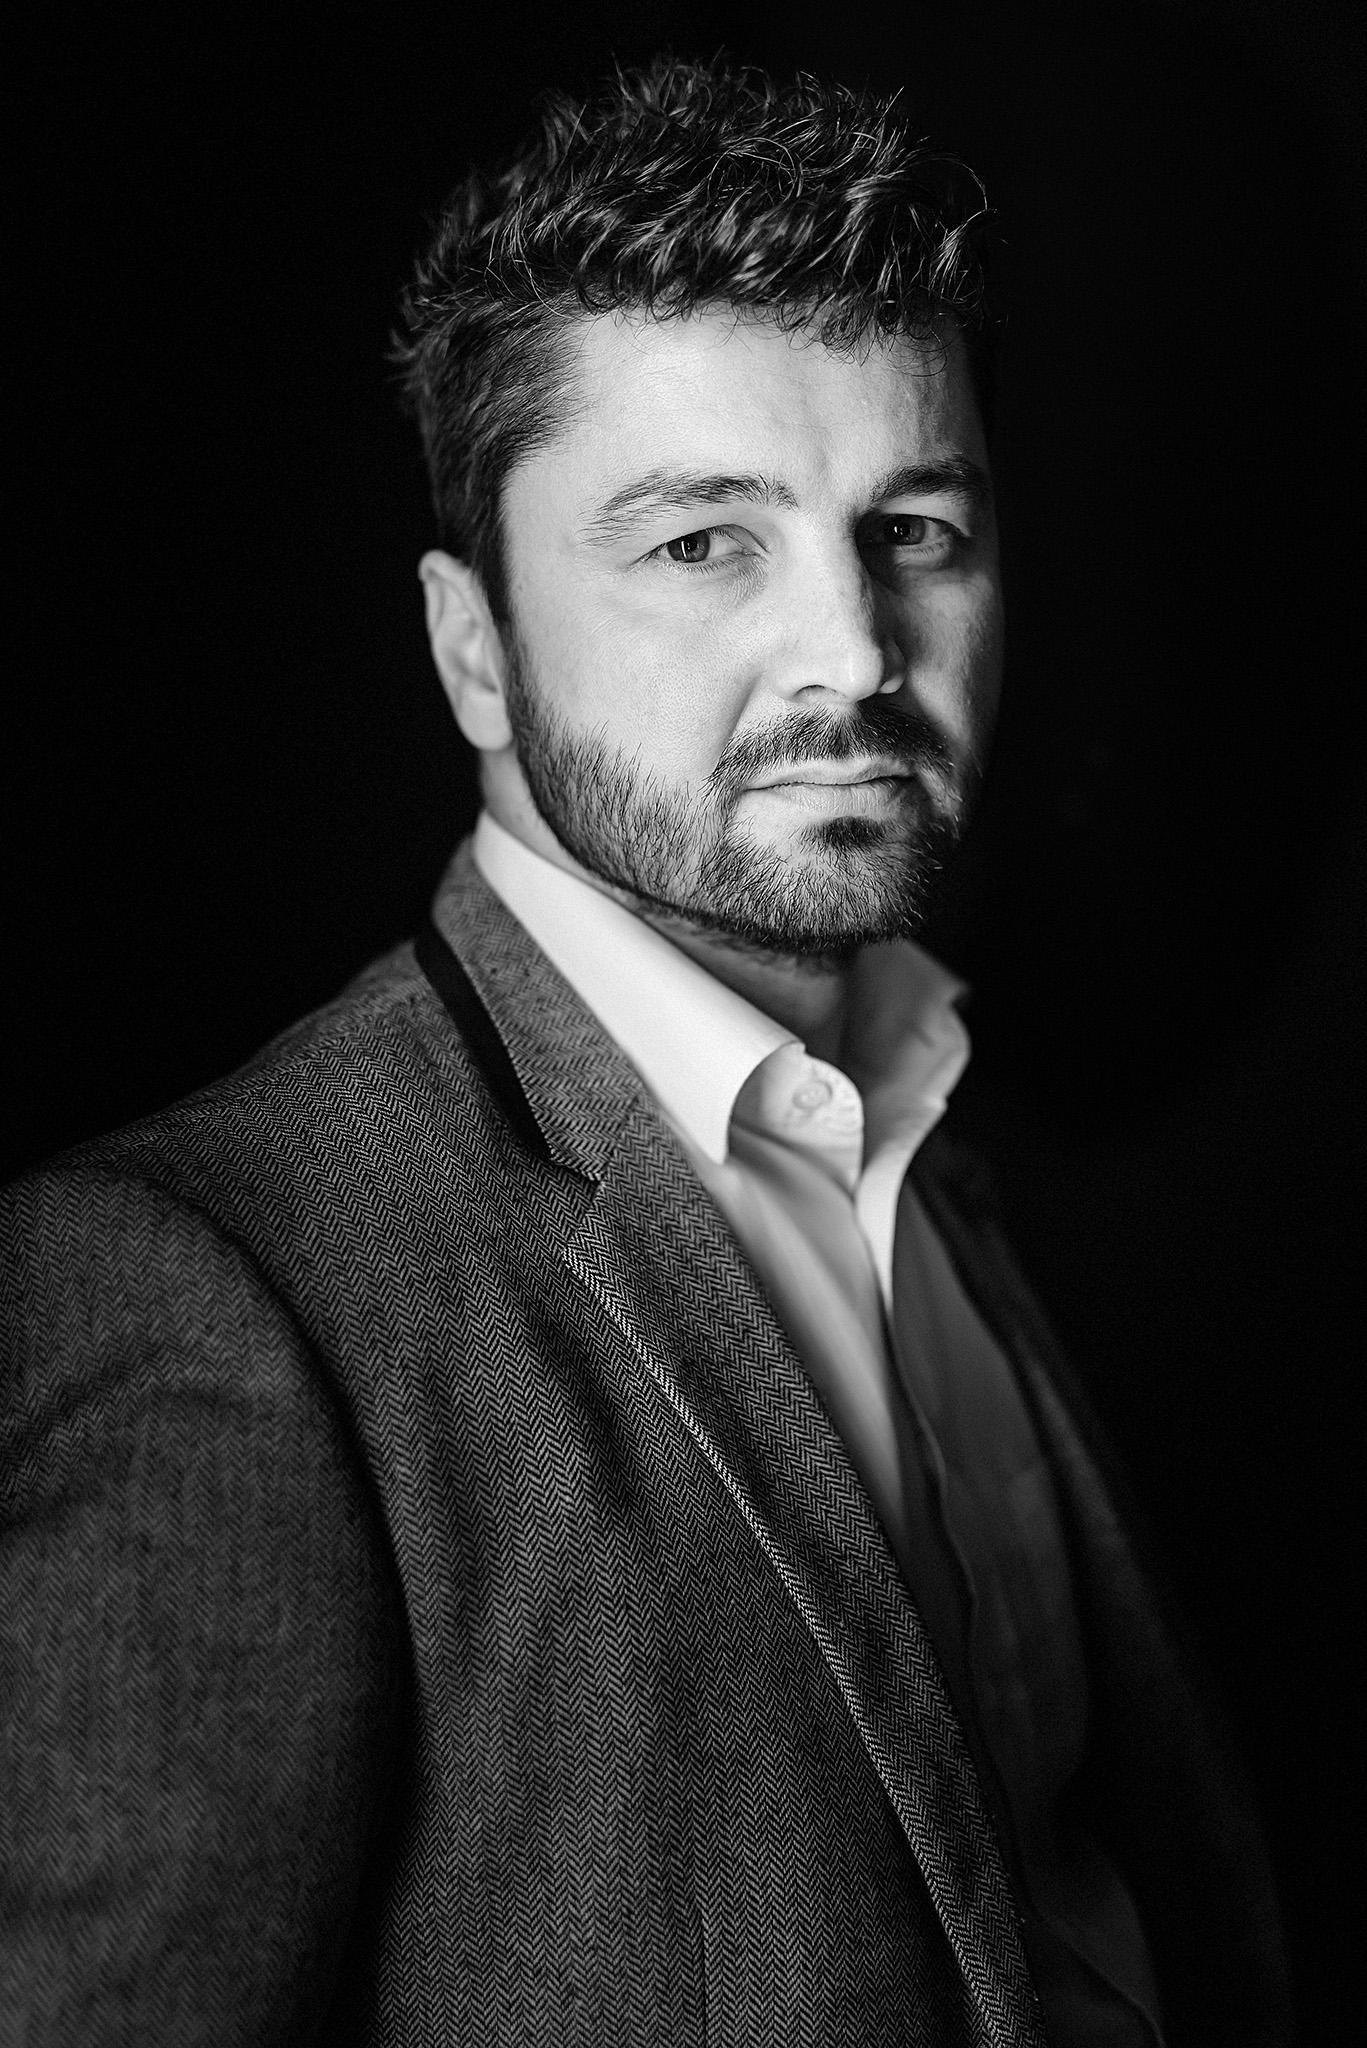 Professional Business Portrait Photography - Executives